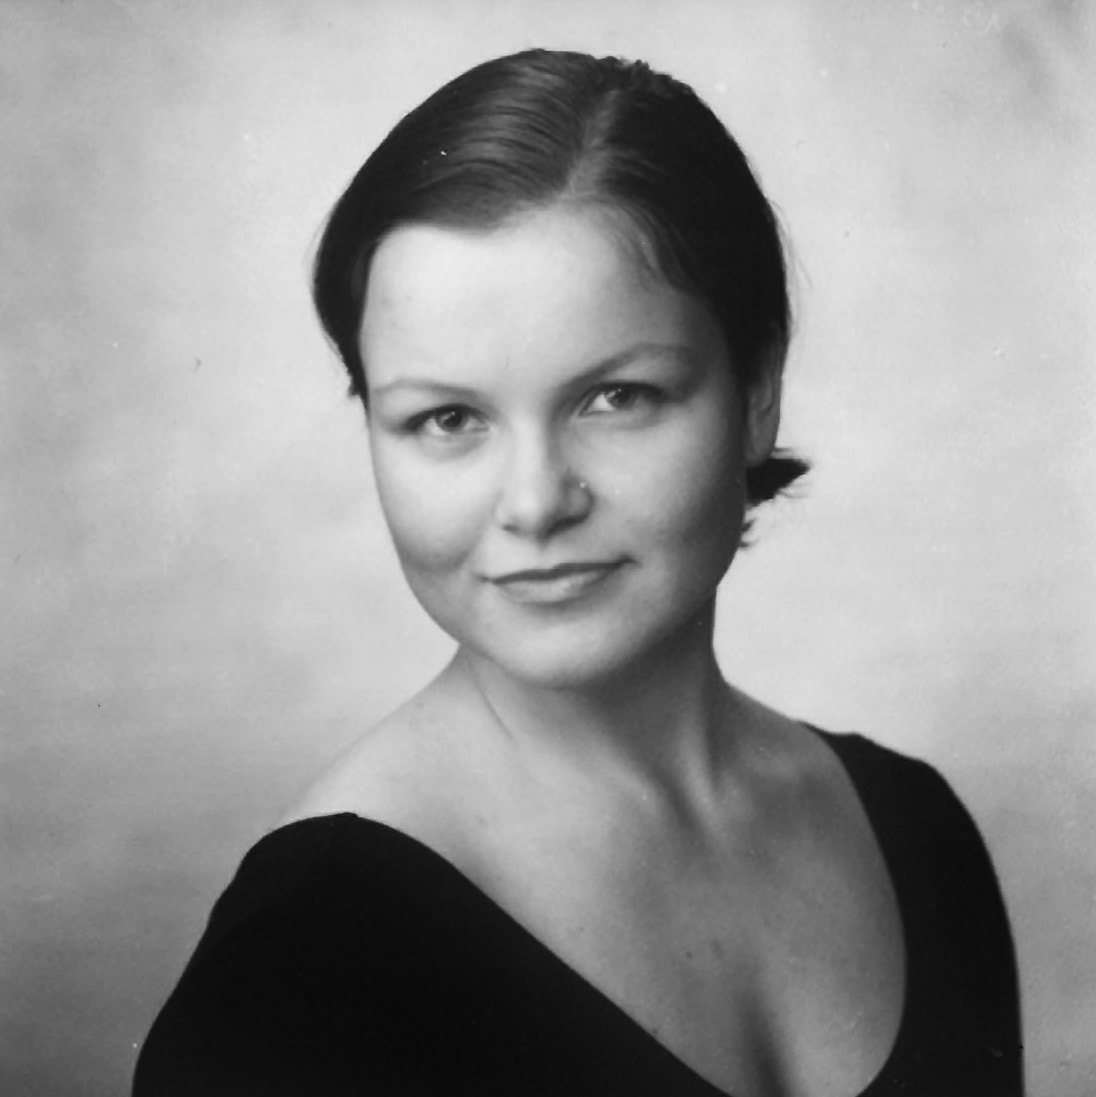 Eline Hagland